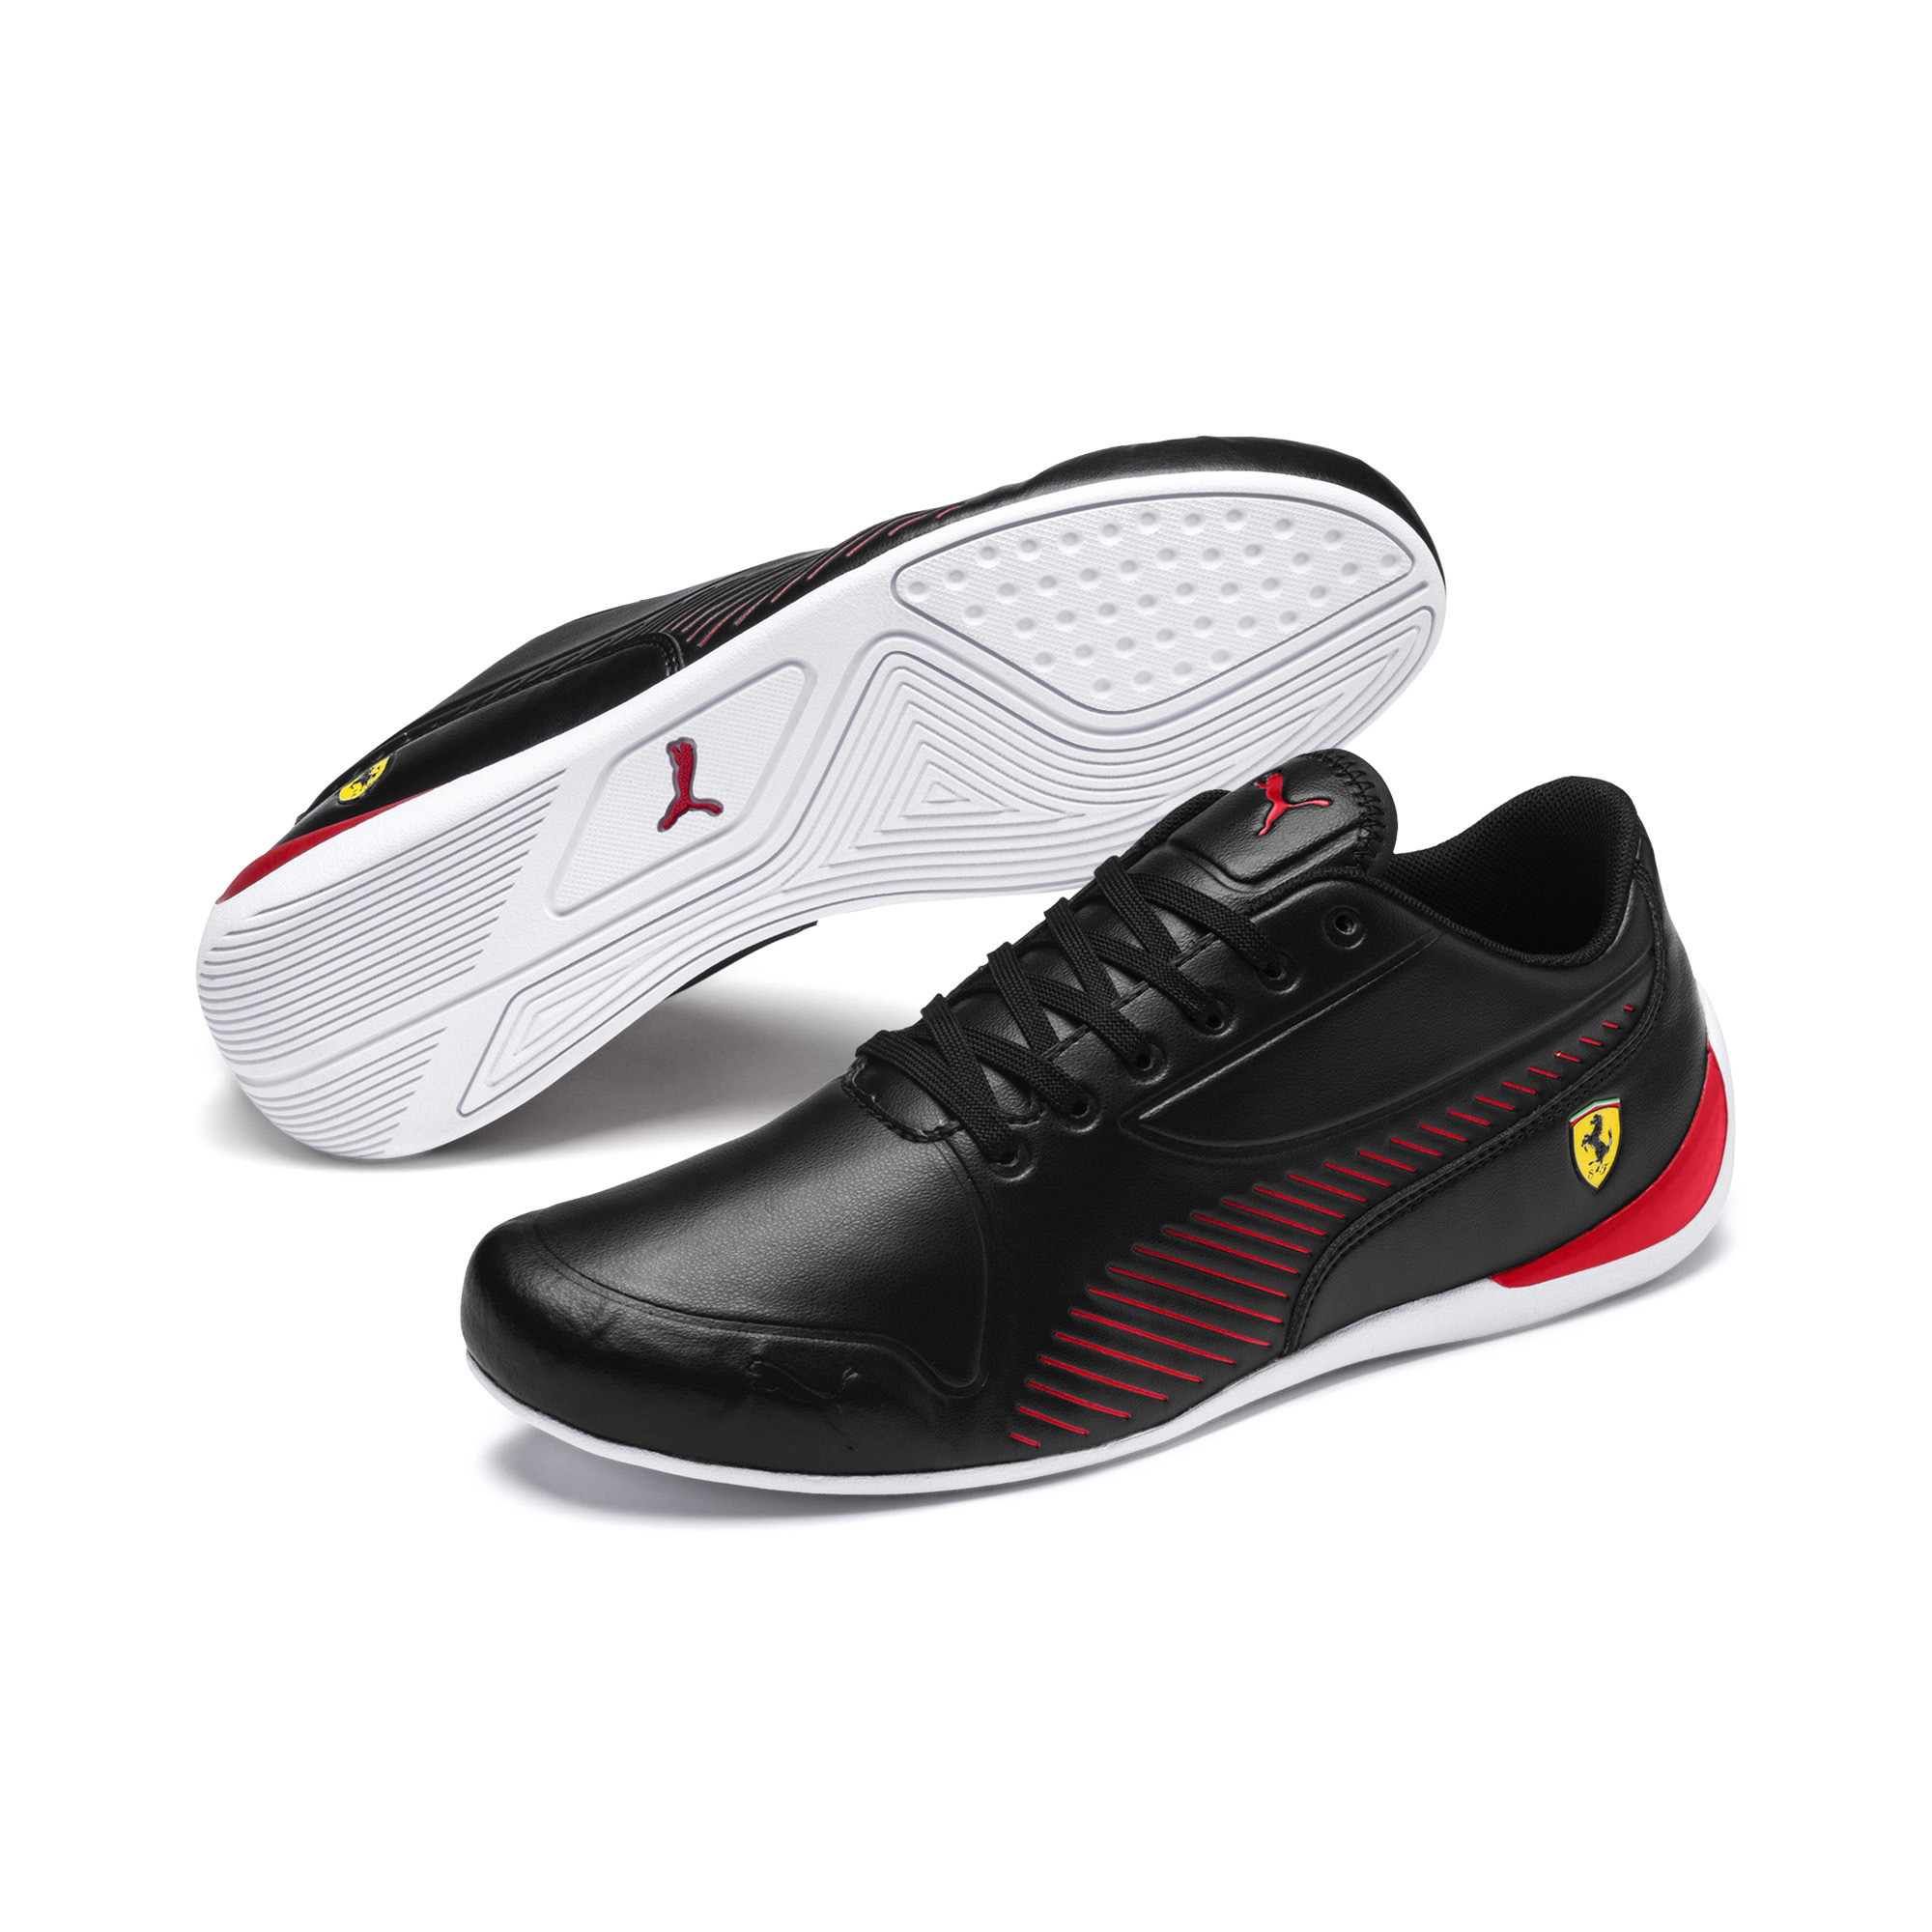 Puma Ferrari Drift Cat 7s Ultra Herren Sneaker Männer Schuhe Neu Ebay